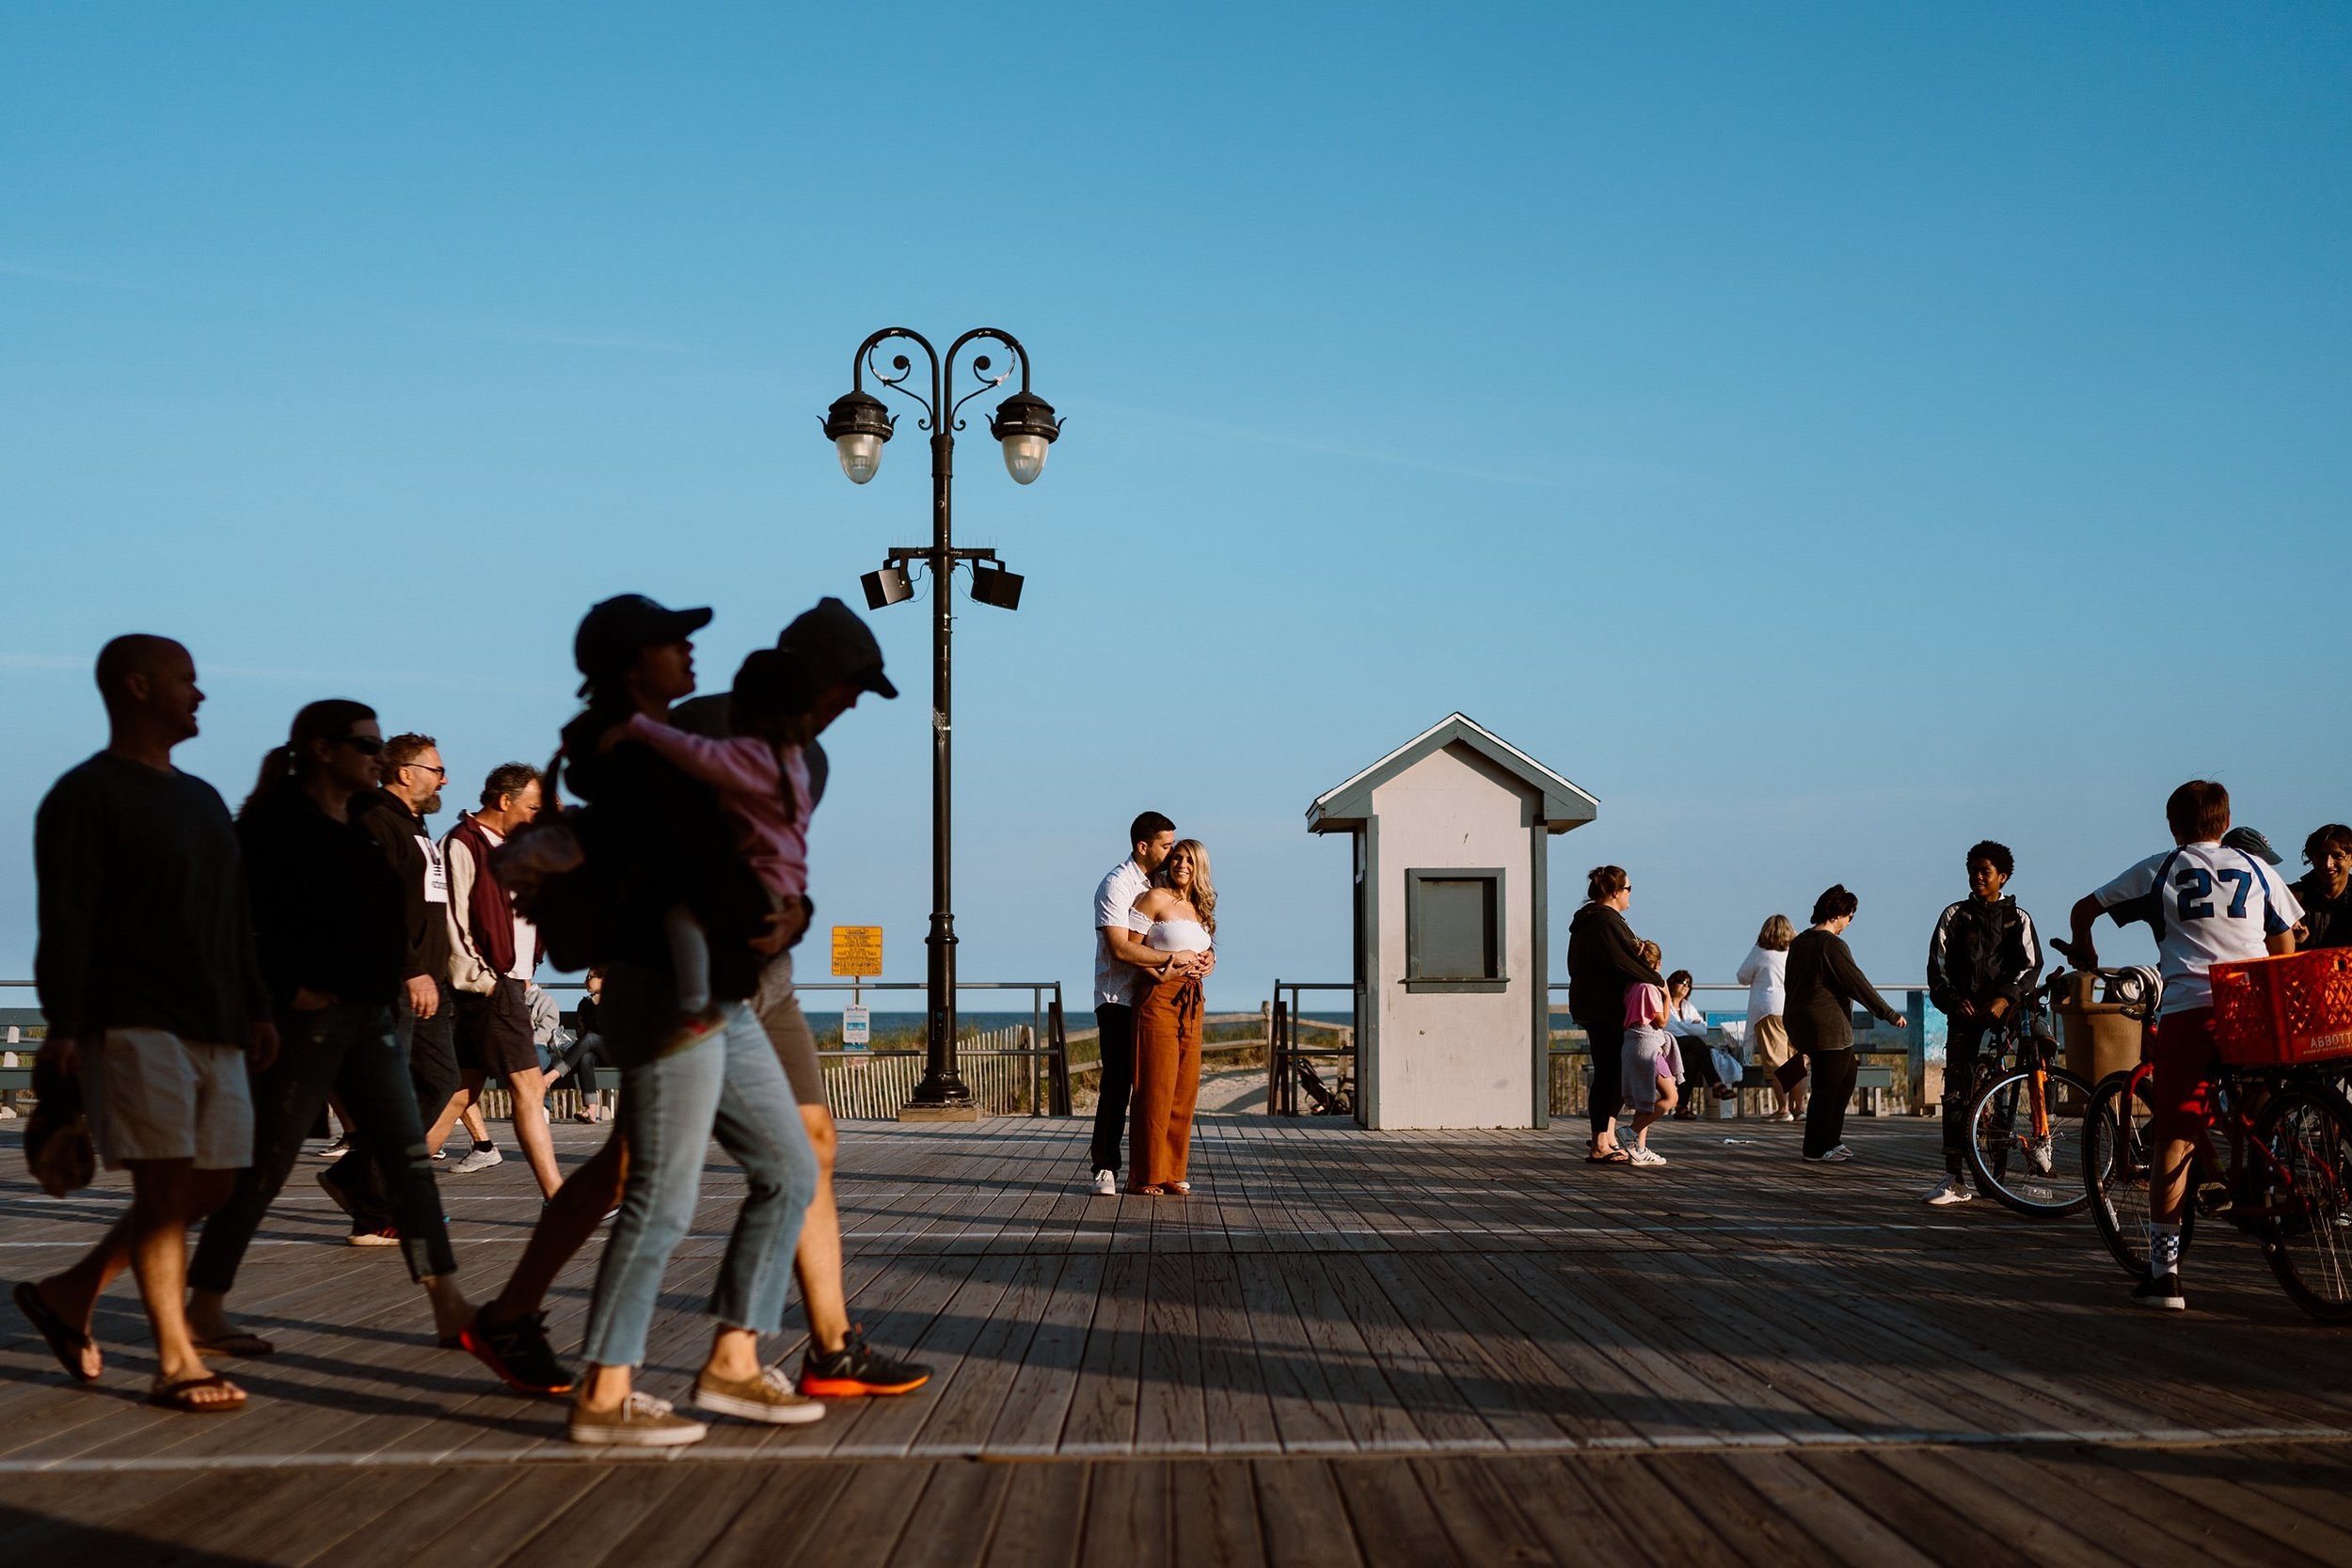 Ocean city boardwalk engagement photo